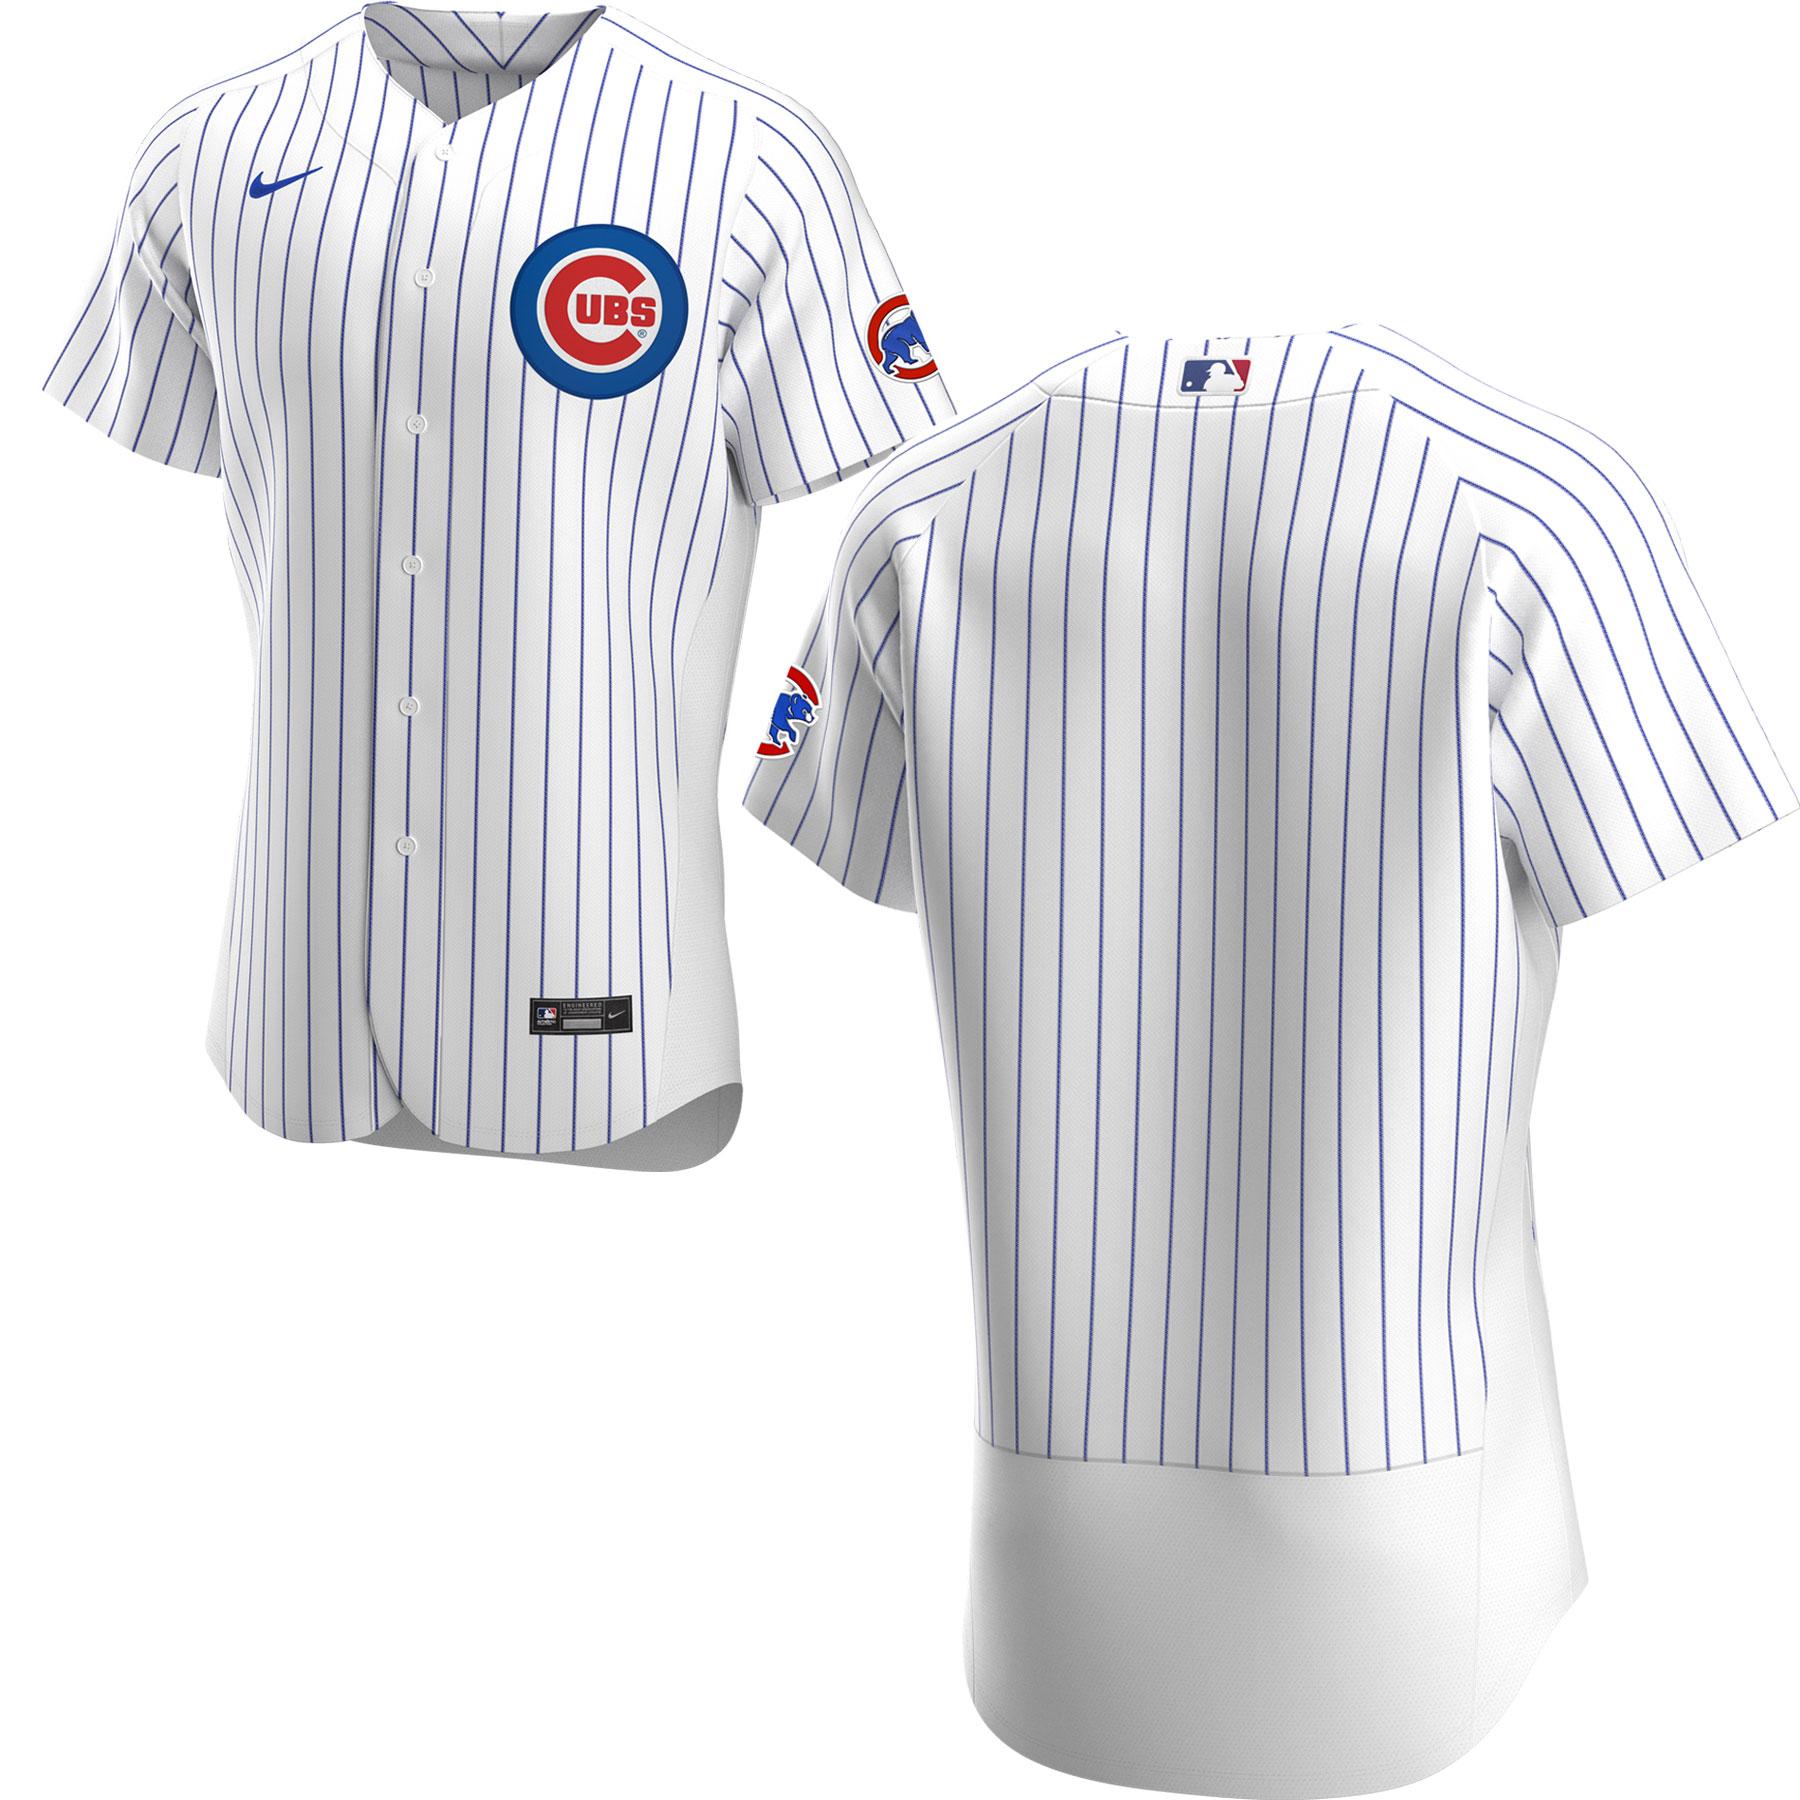 official jerseys